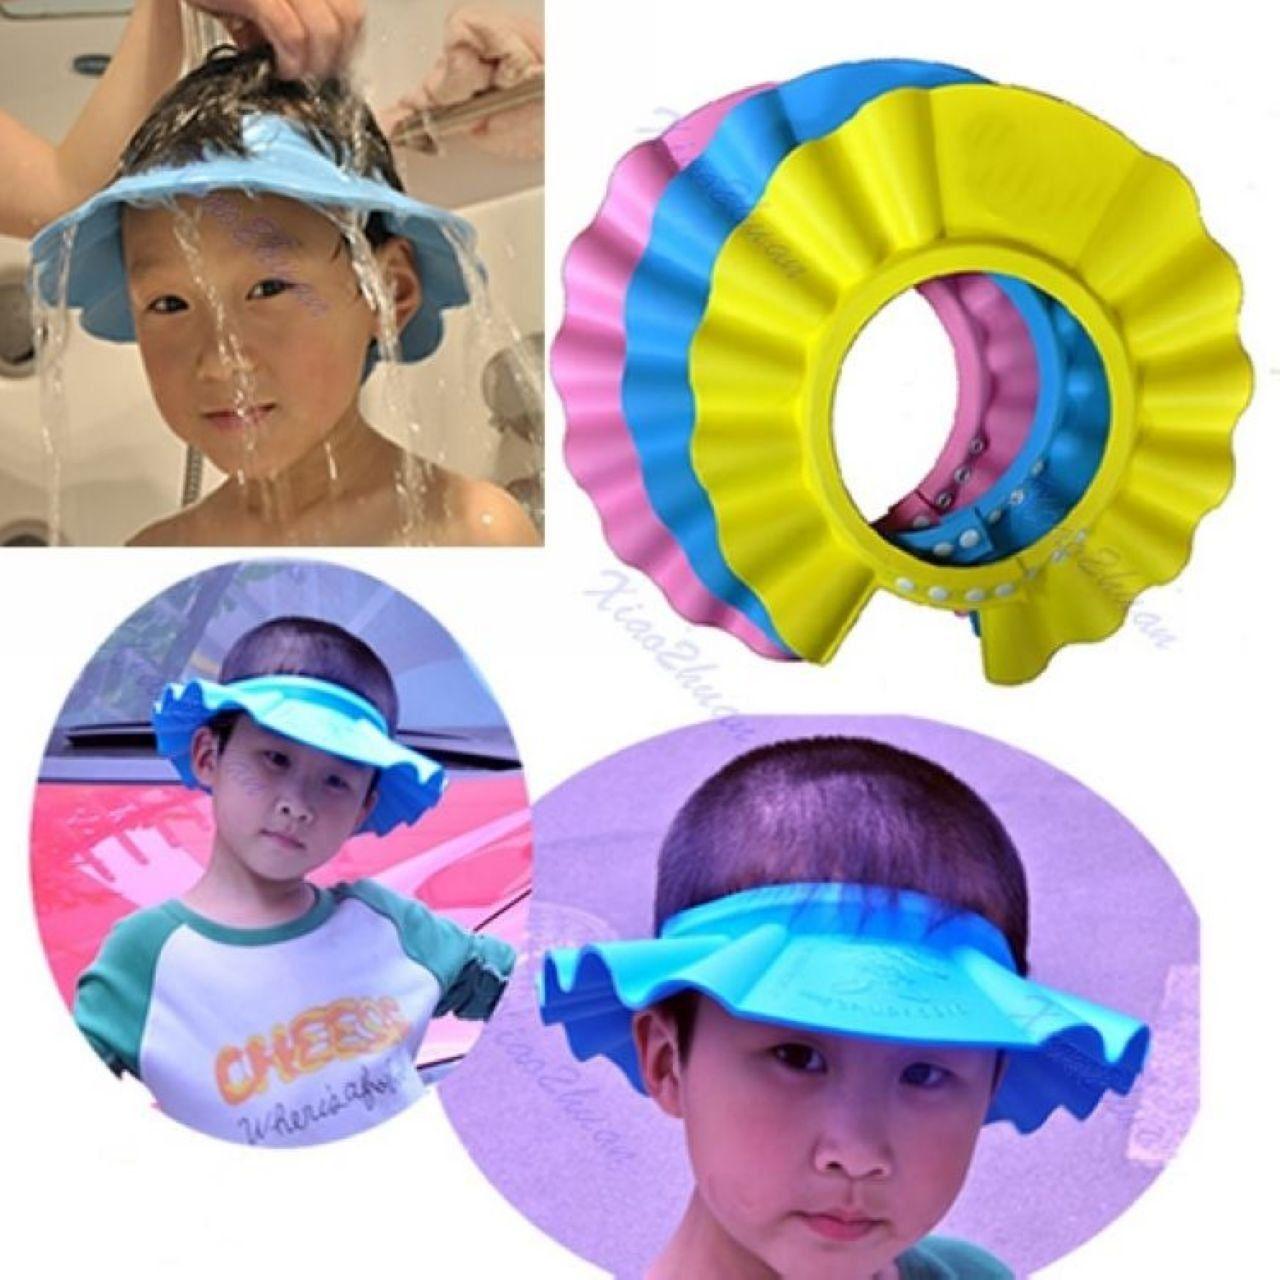 Robot Check Kids Shampoo Washing Hair Shower Cap